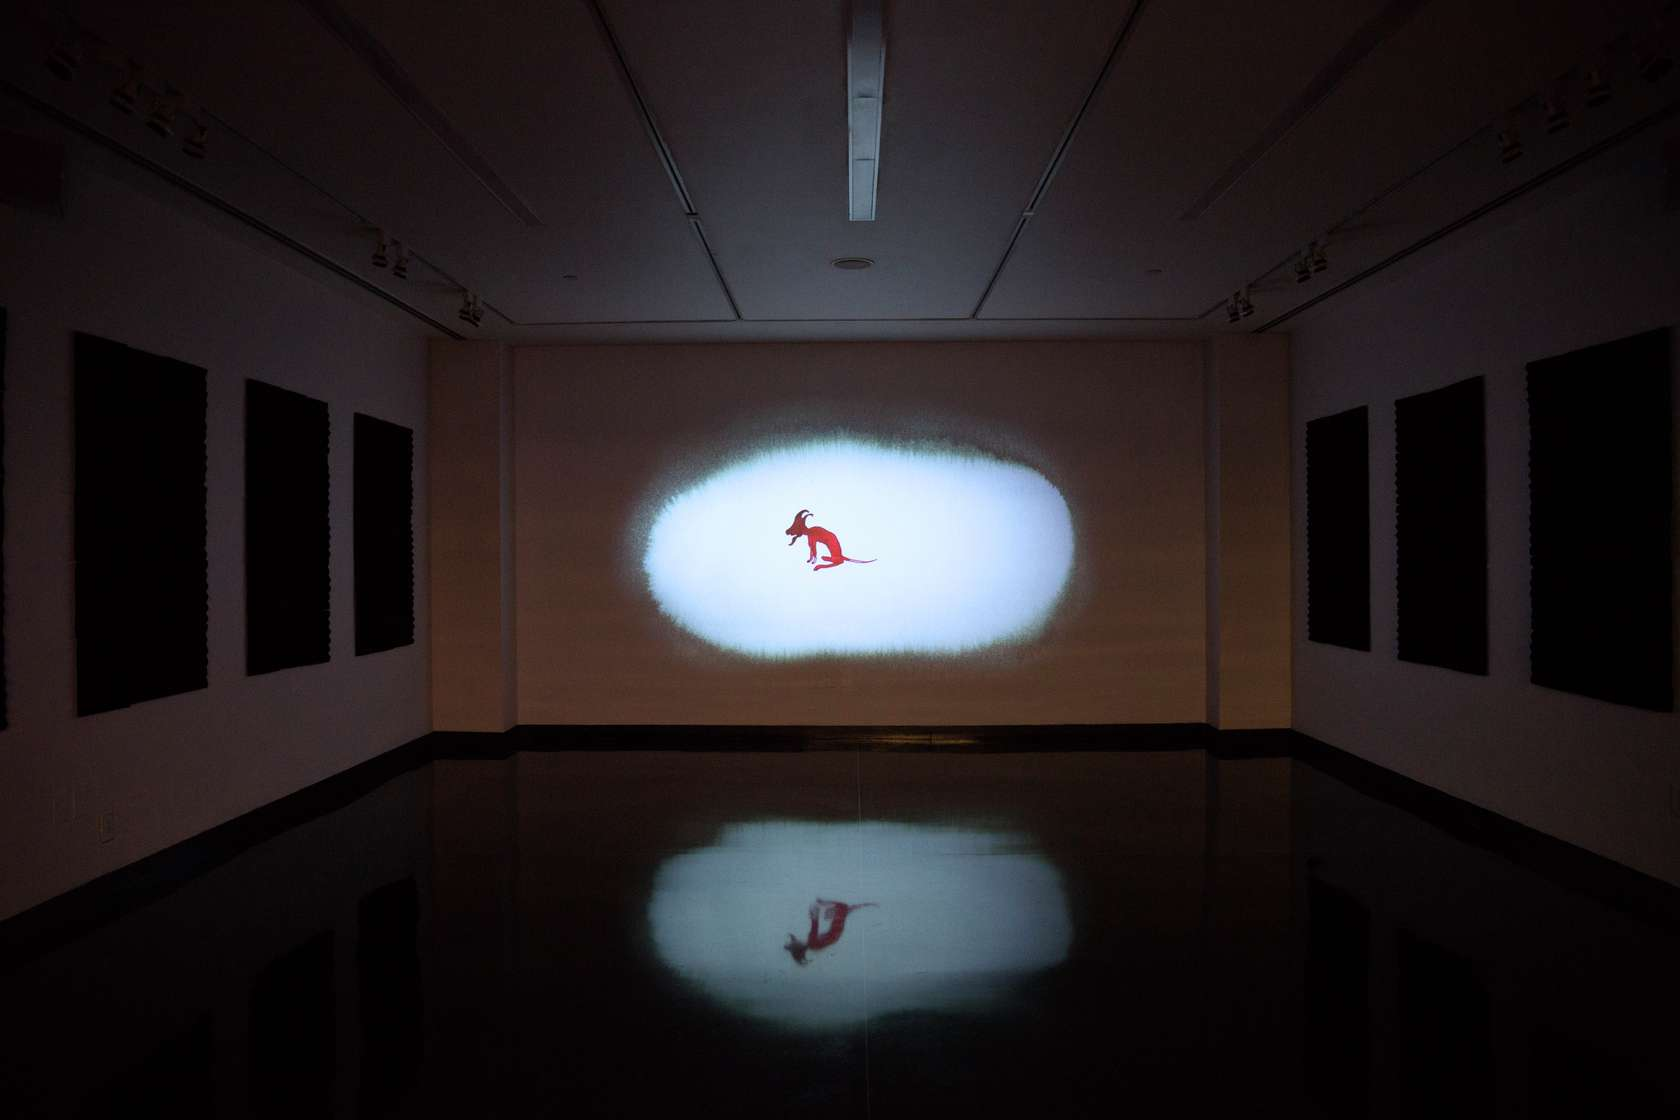 Françoise Pétrovitch Taming Nature : Animated Perspectives Semiose 13 janvier  — 23 février 2019